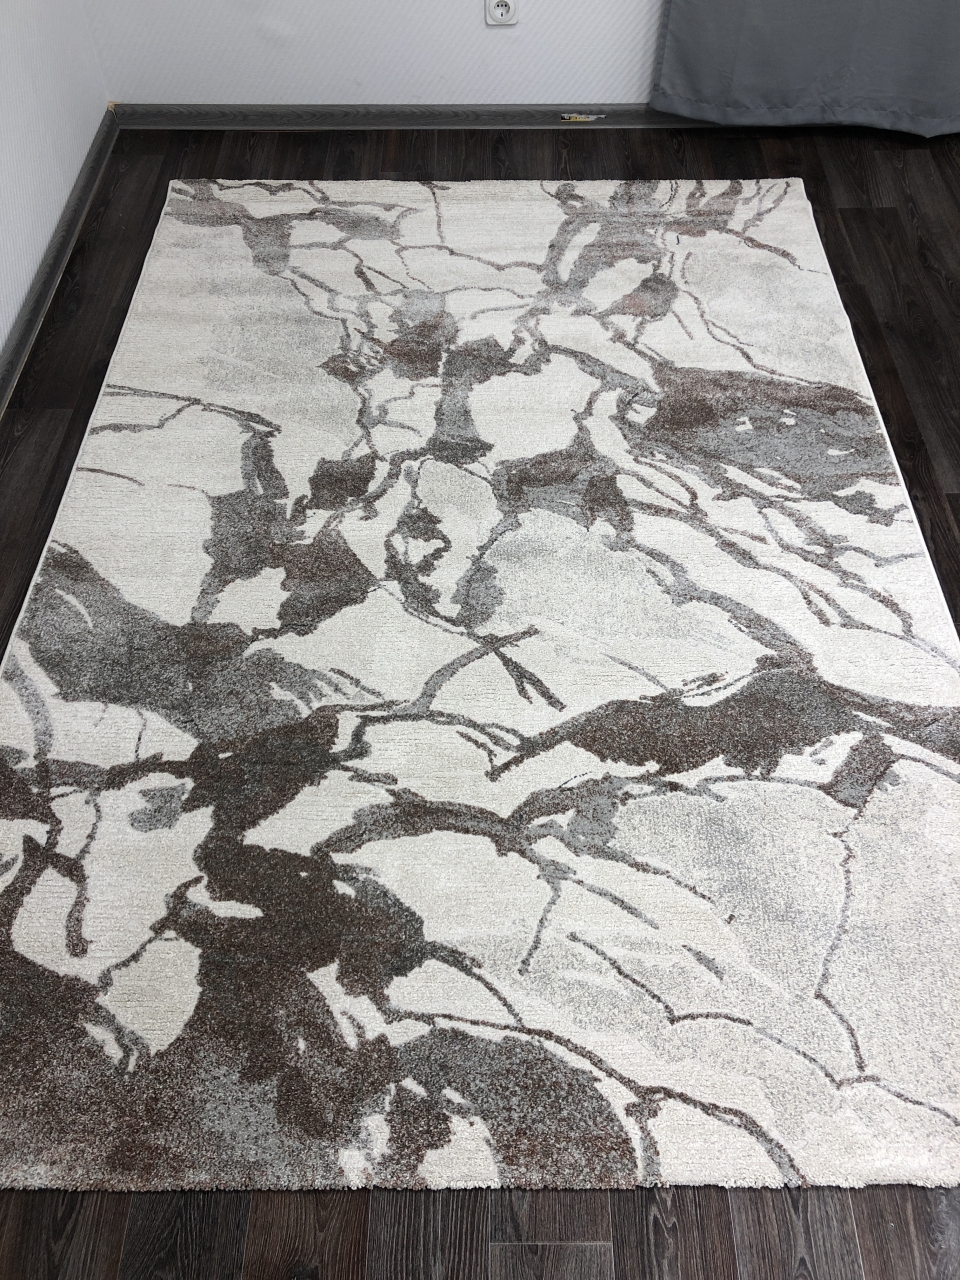 Ковер 46014 - 6111 - Прямоугольник - коллекция Valentino - фото 1